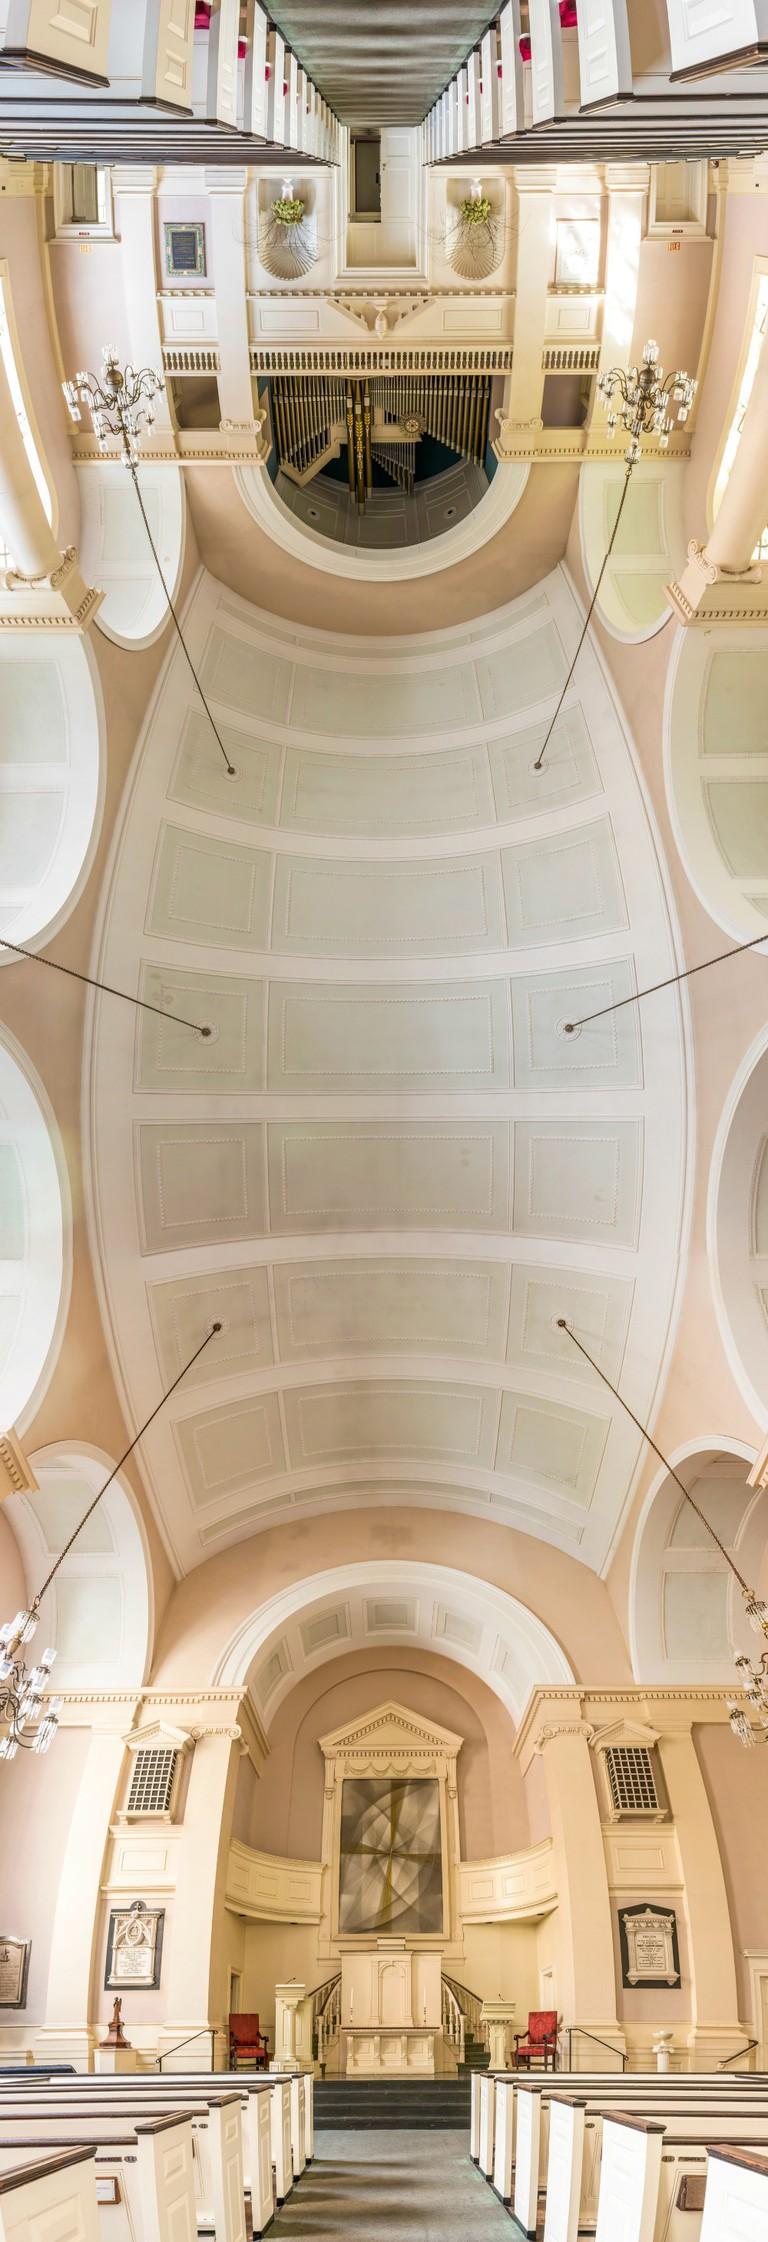 All Souls Church | © Richard Silver